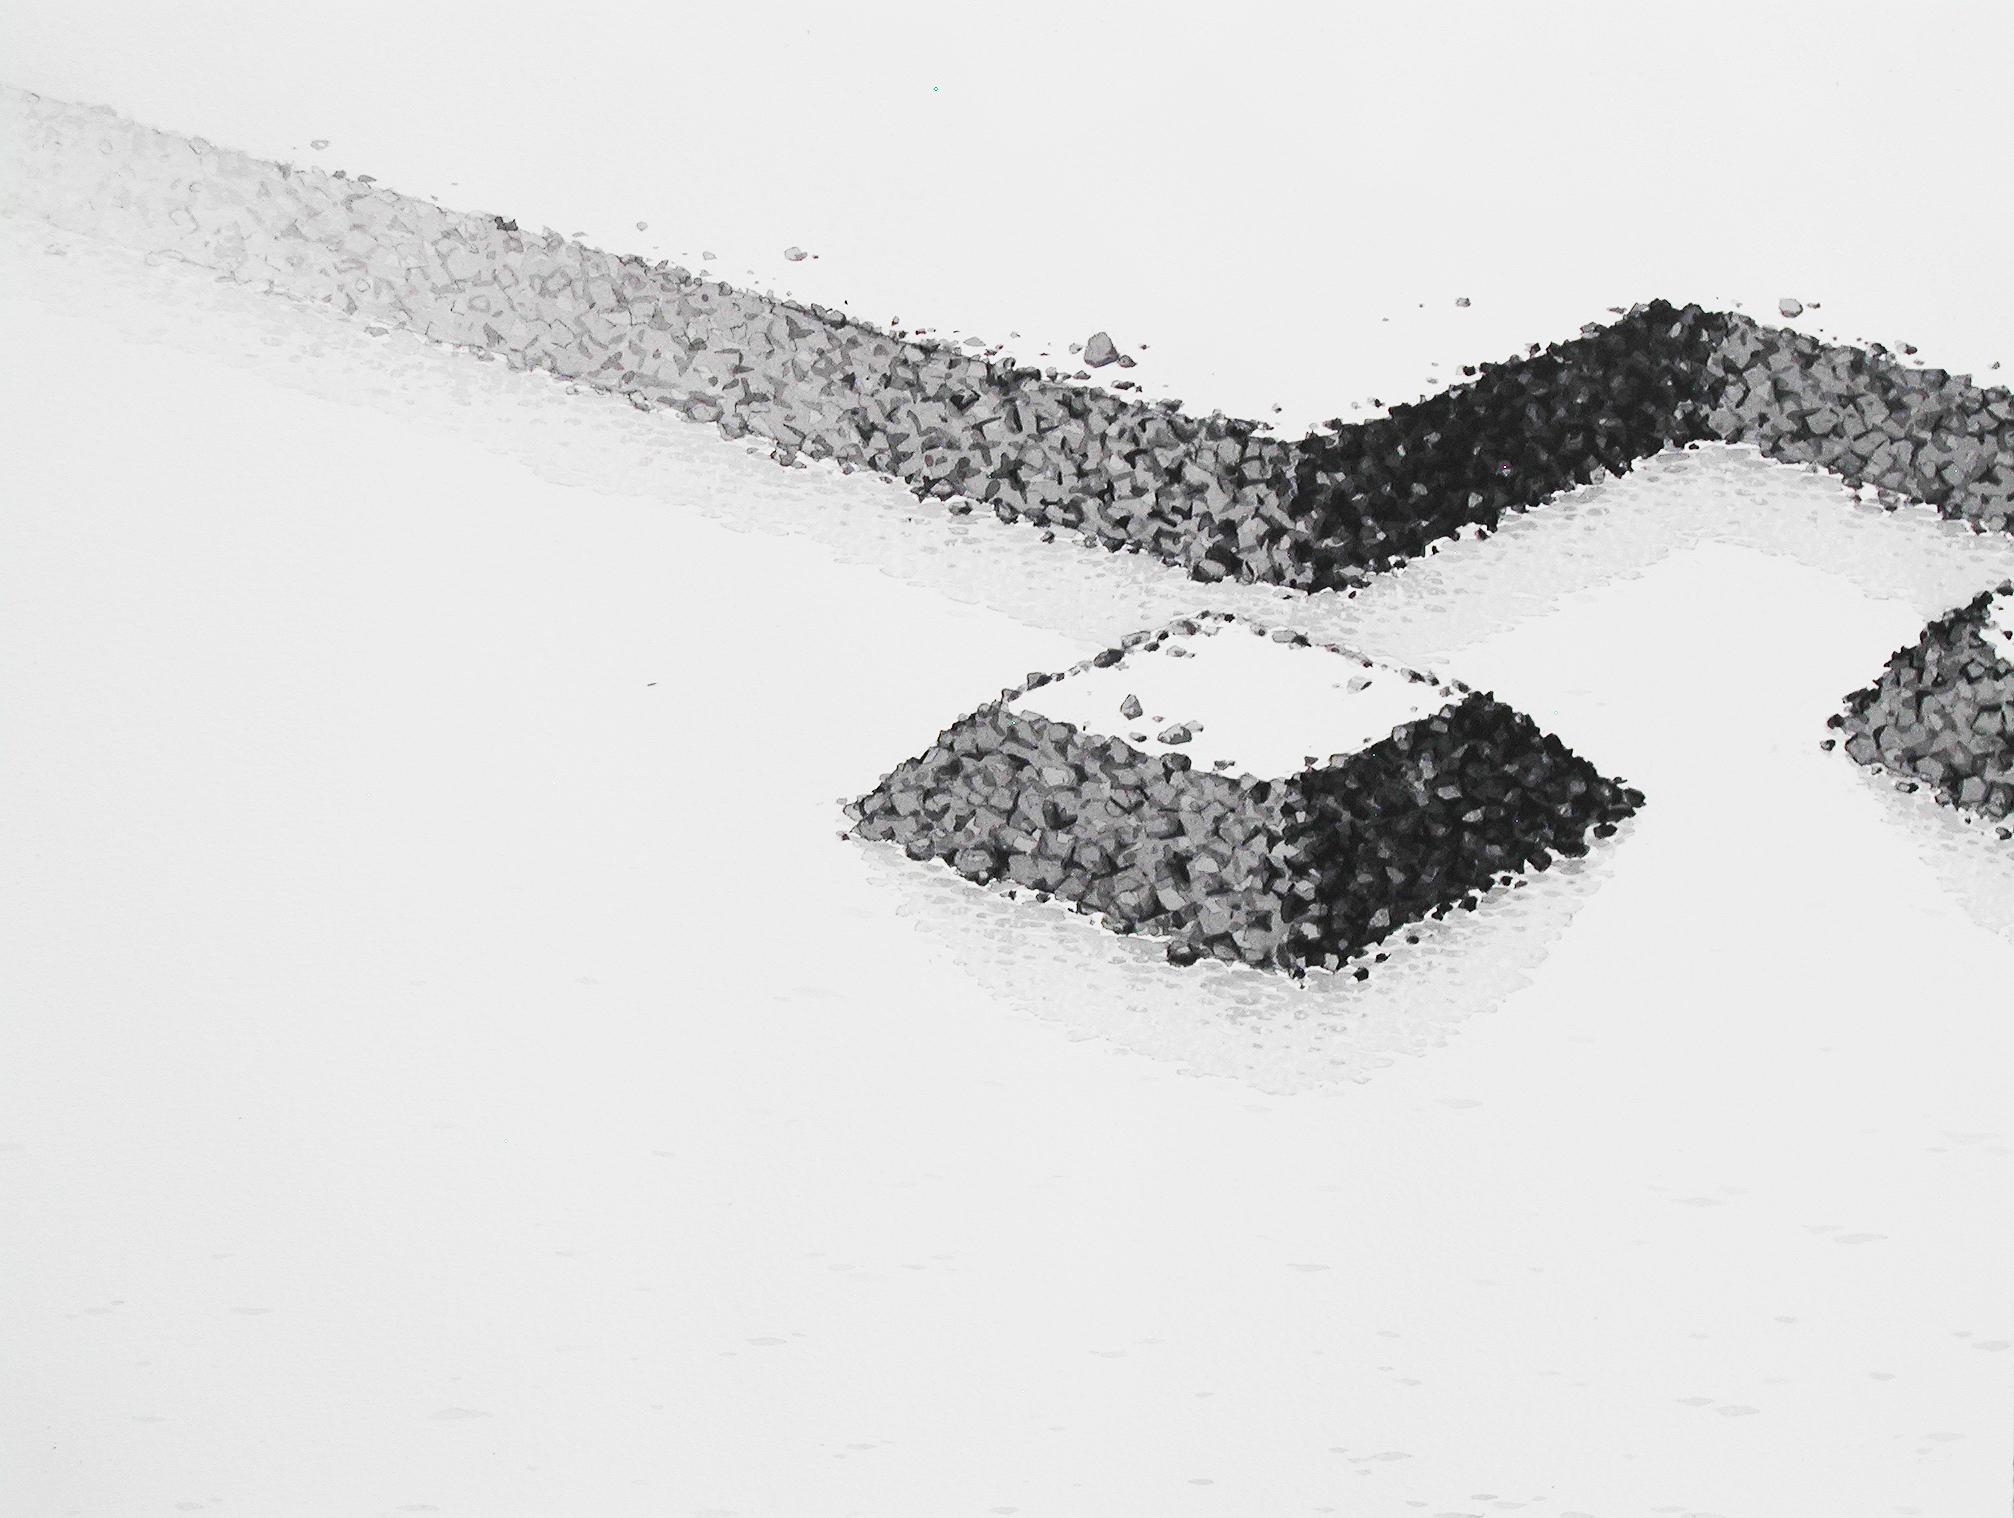 Chris Ballantyne   Island  2014 india ink on paper 12 x 16 in